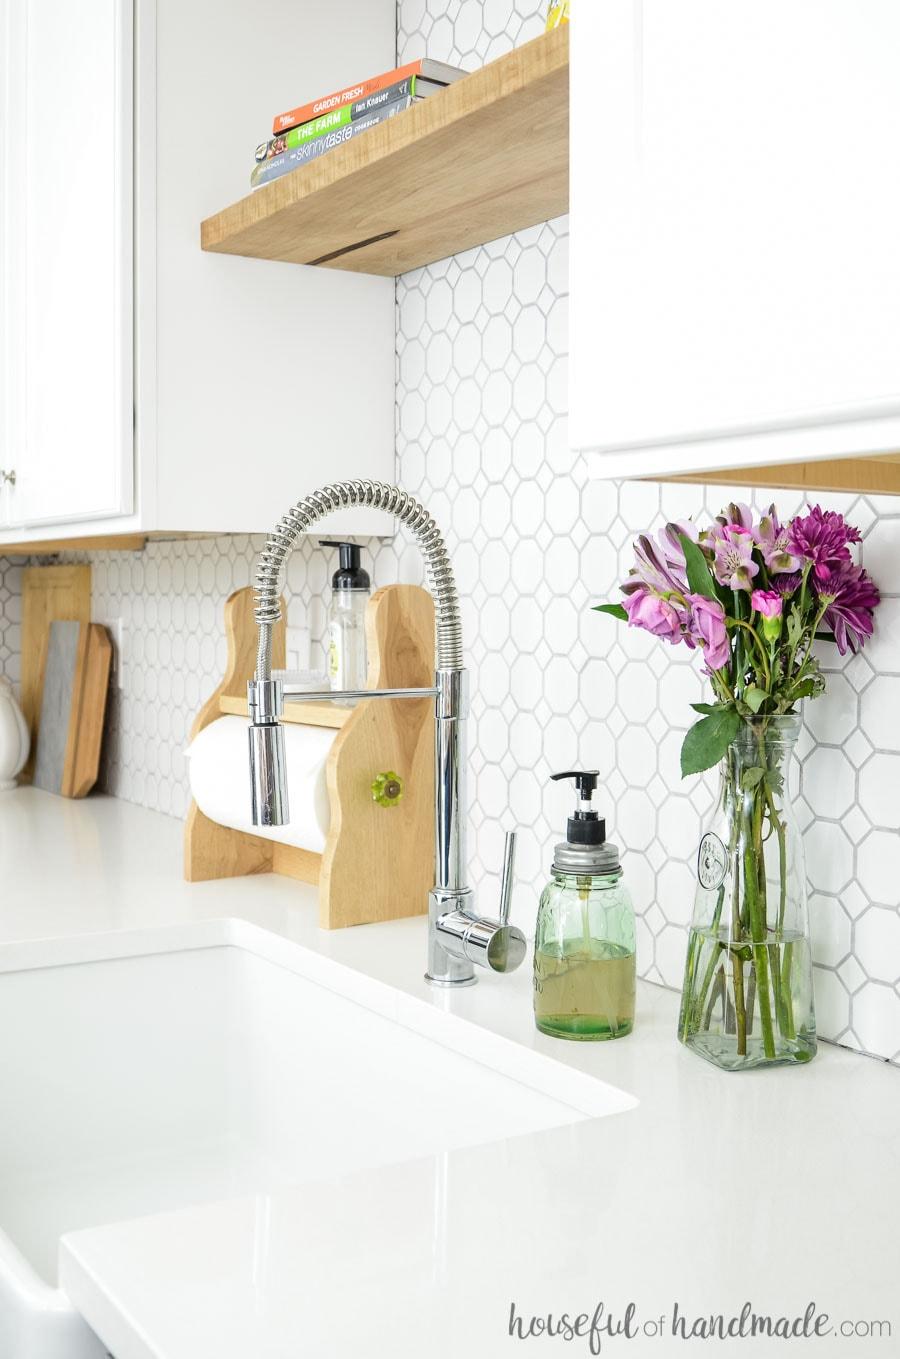 Beautiful apron front sink with white quartz countertops. Decorated with purple flowers, mason jar soap dispenser, wood farmhouse paper towel holder and white tile backsplash. Housefulofhandmade.com